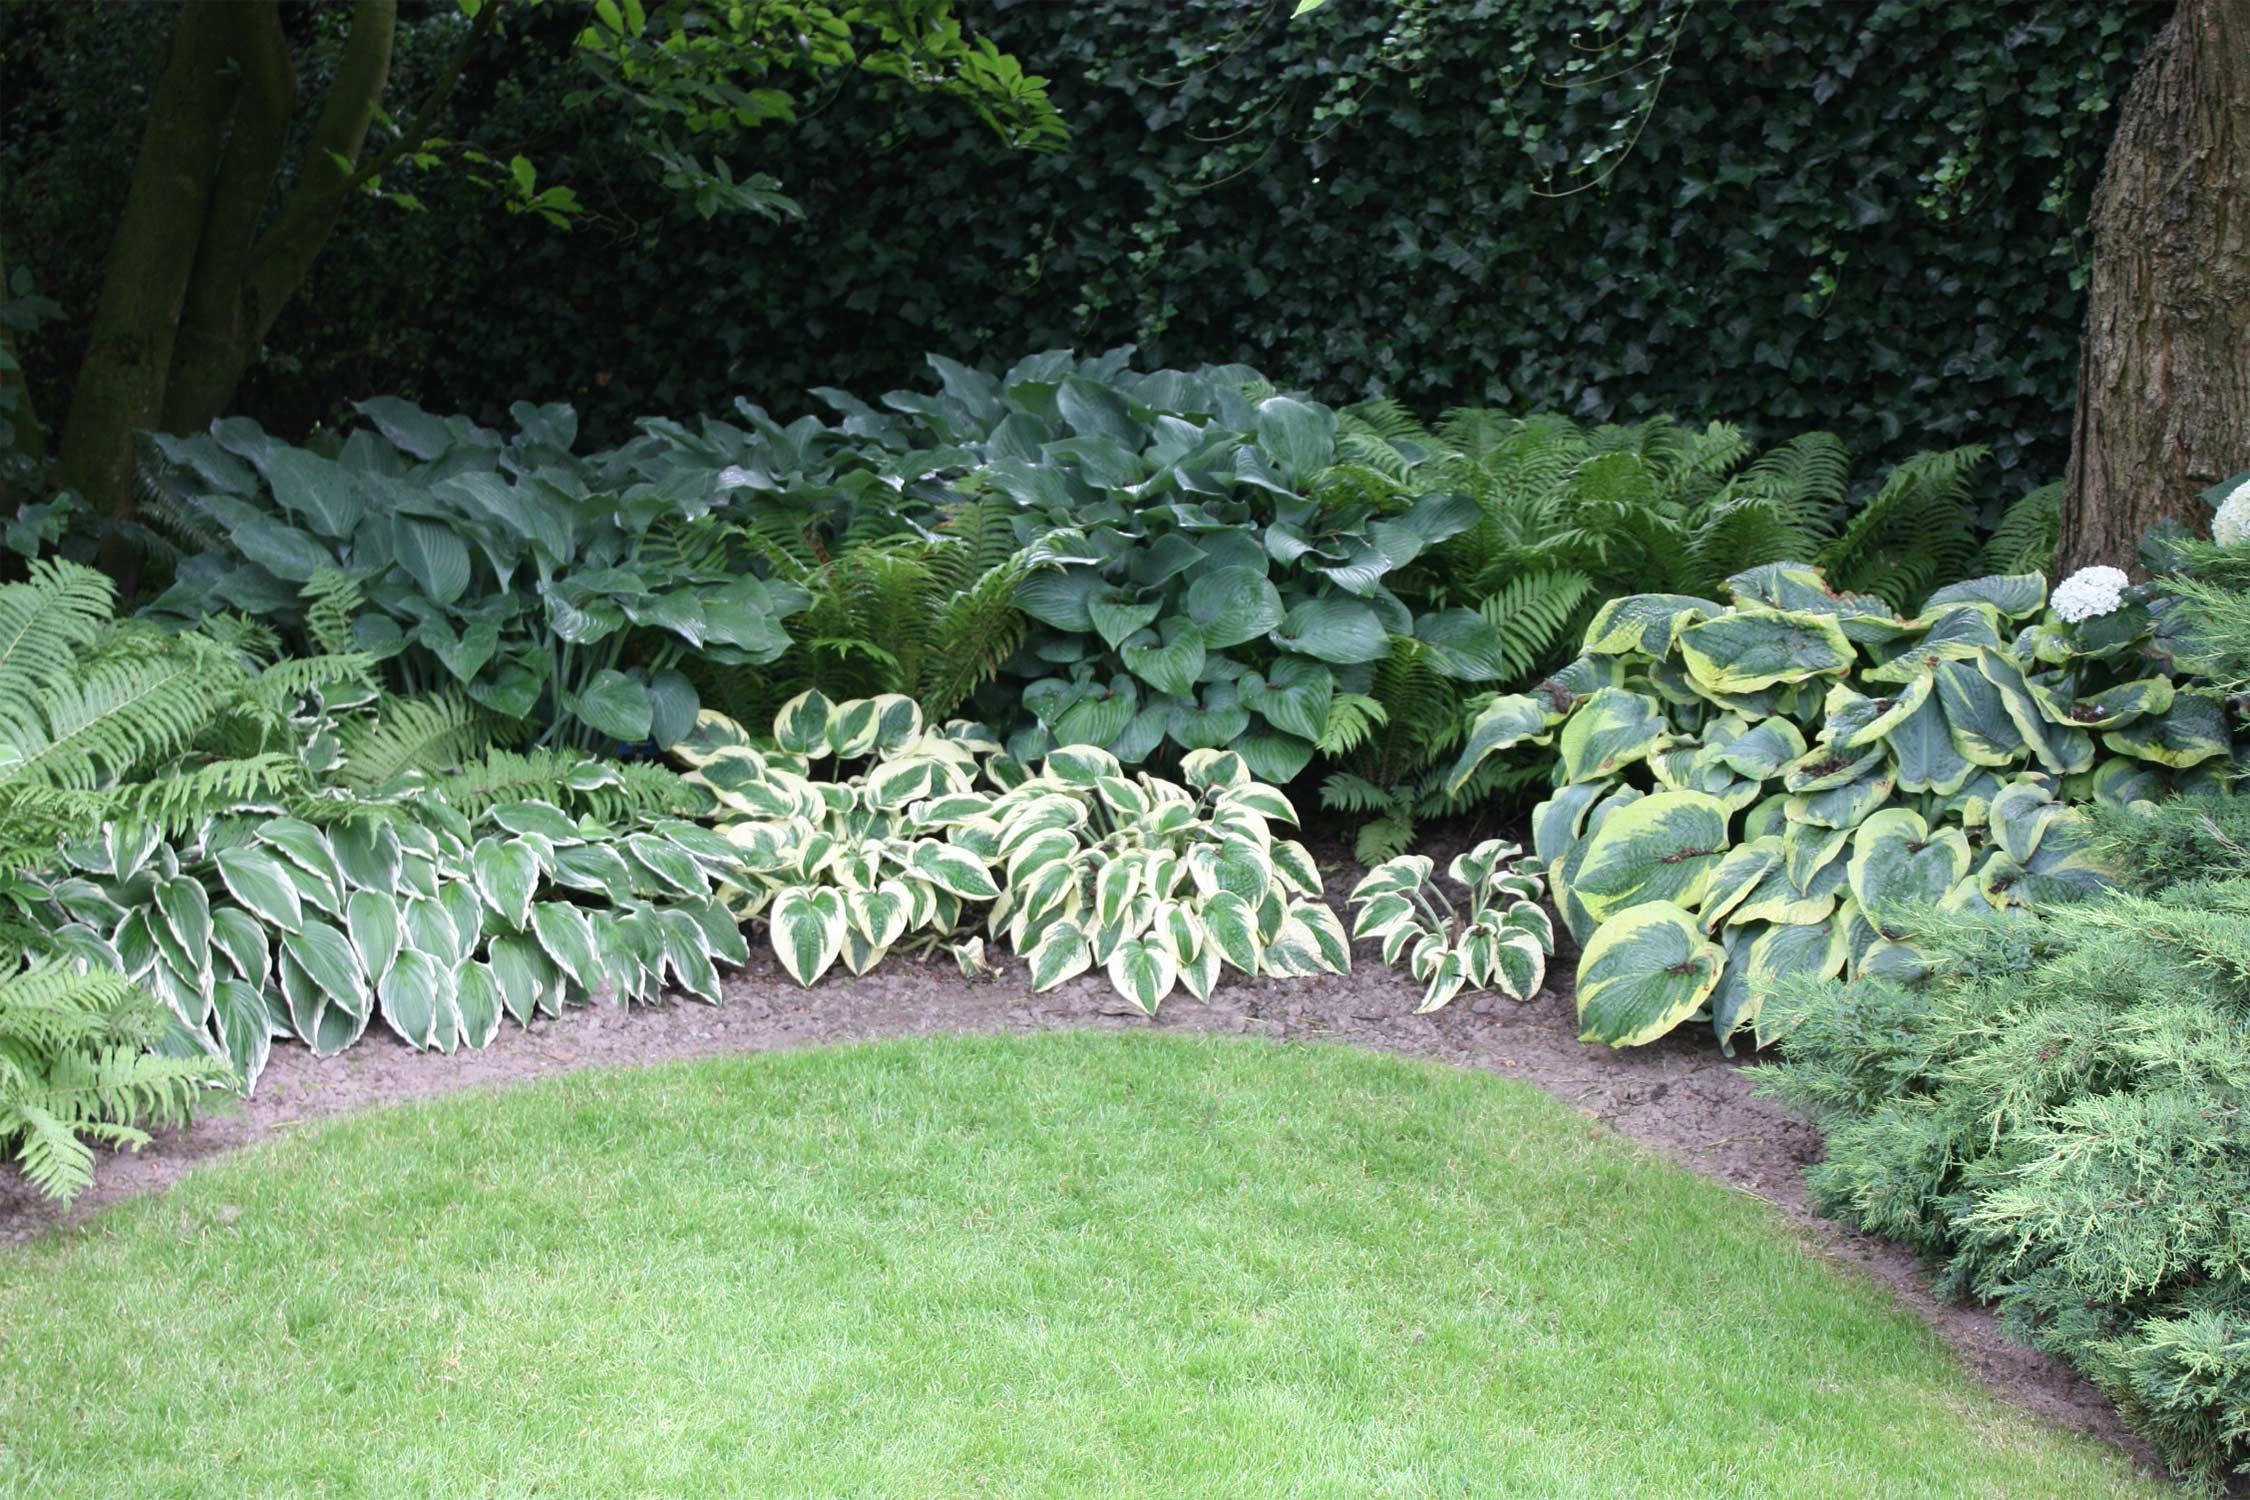 Gartentipp Schattenbeet Richtig Planen Und Anlegen Native Plants Schattenpflanzen Garten Garten Bepflanzen Garten